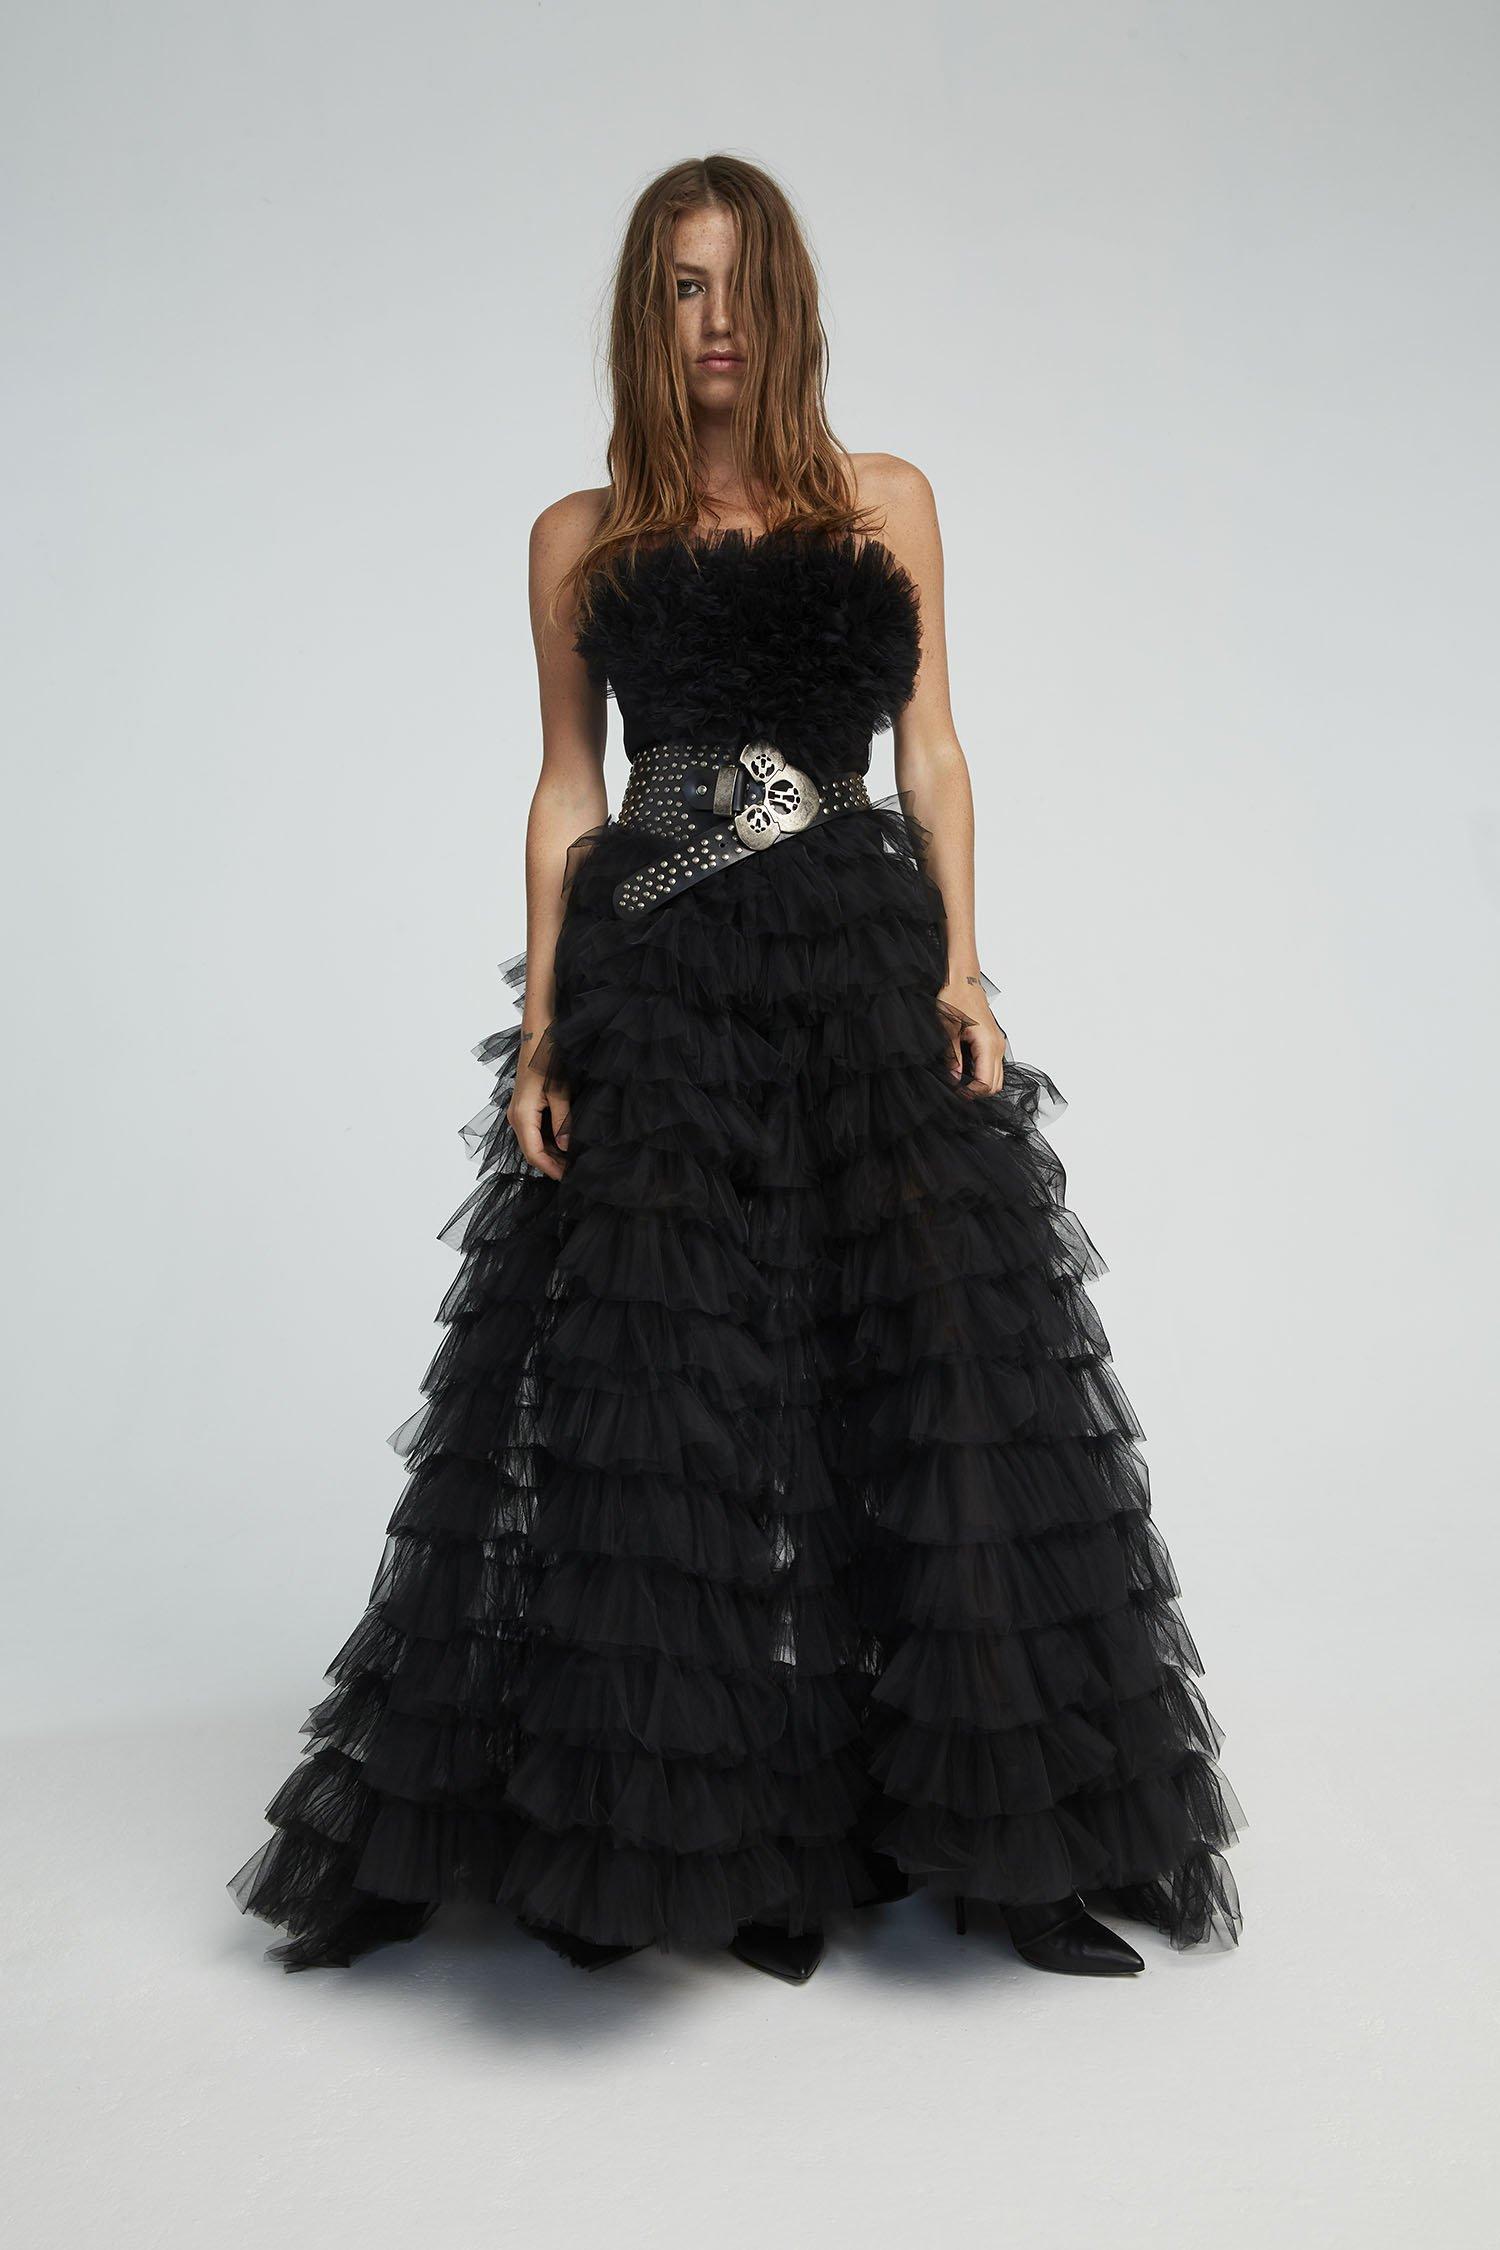 TULL DRESS